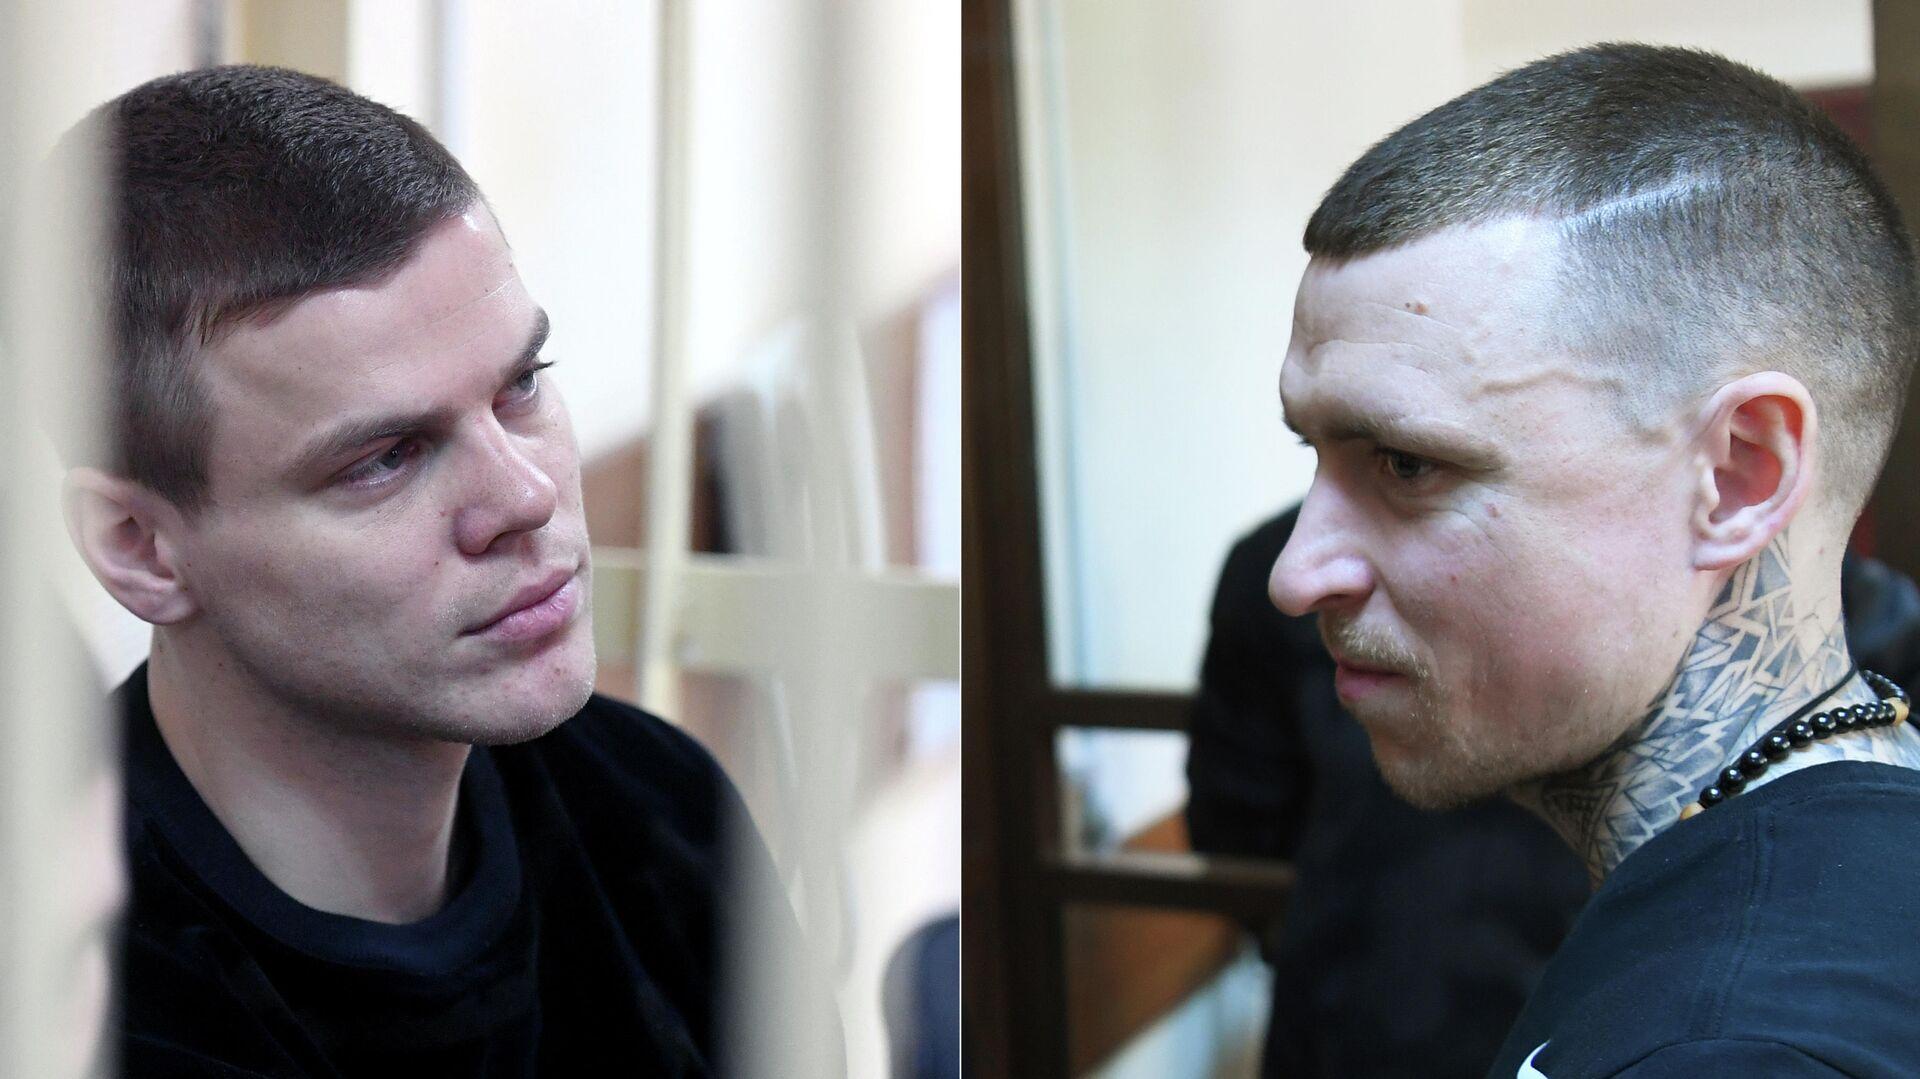 Футболисты Александр Кокорин и Павел Мамаев в суде - РИА Новости, 1920, 03.06.2021